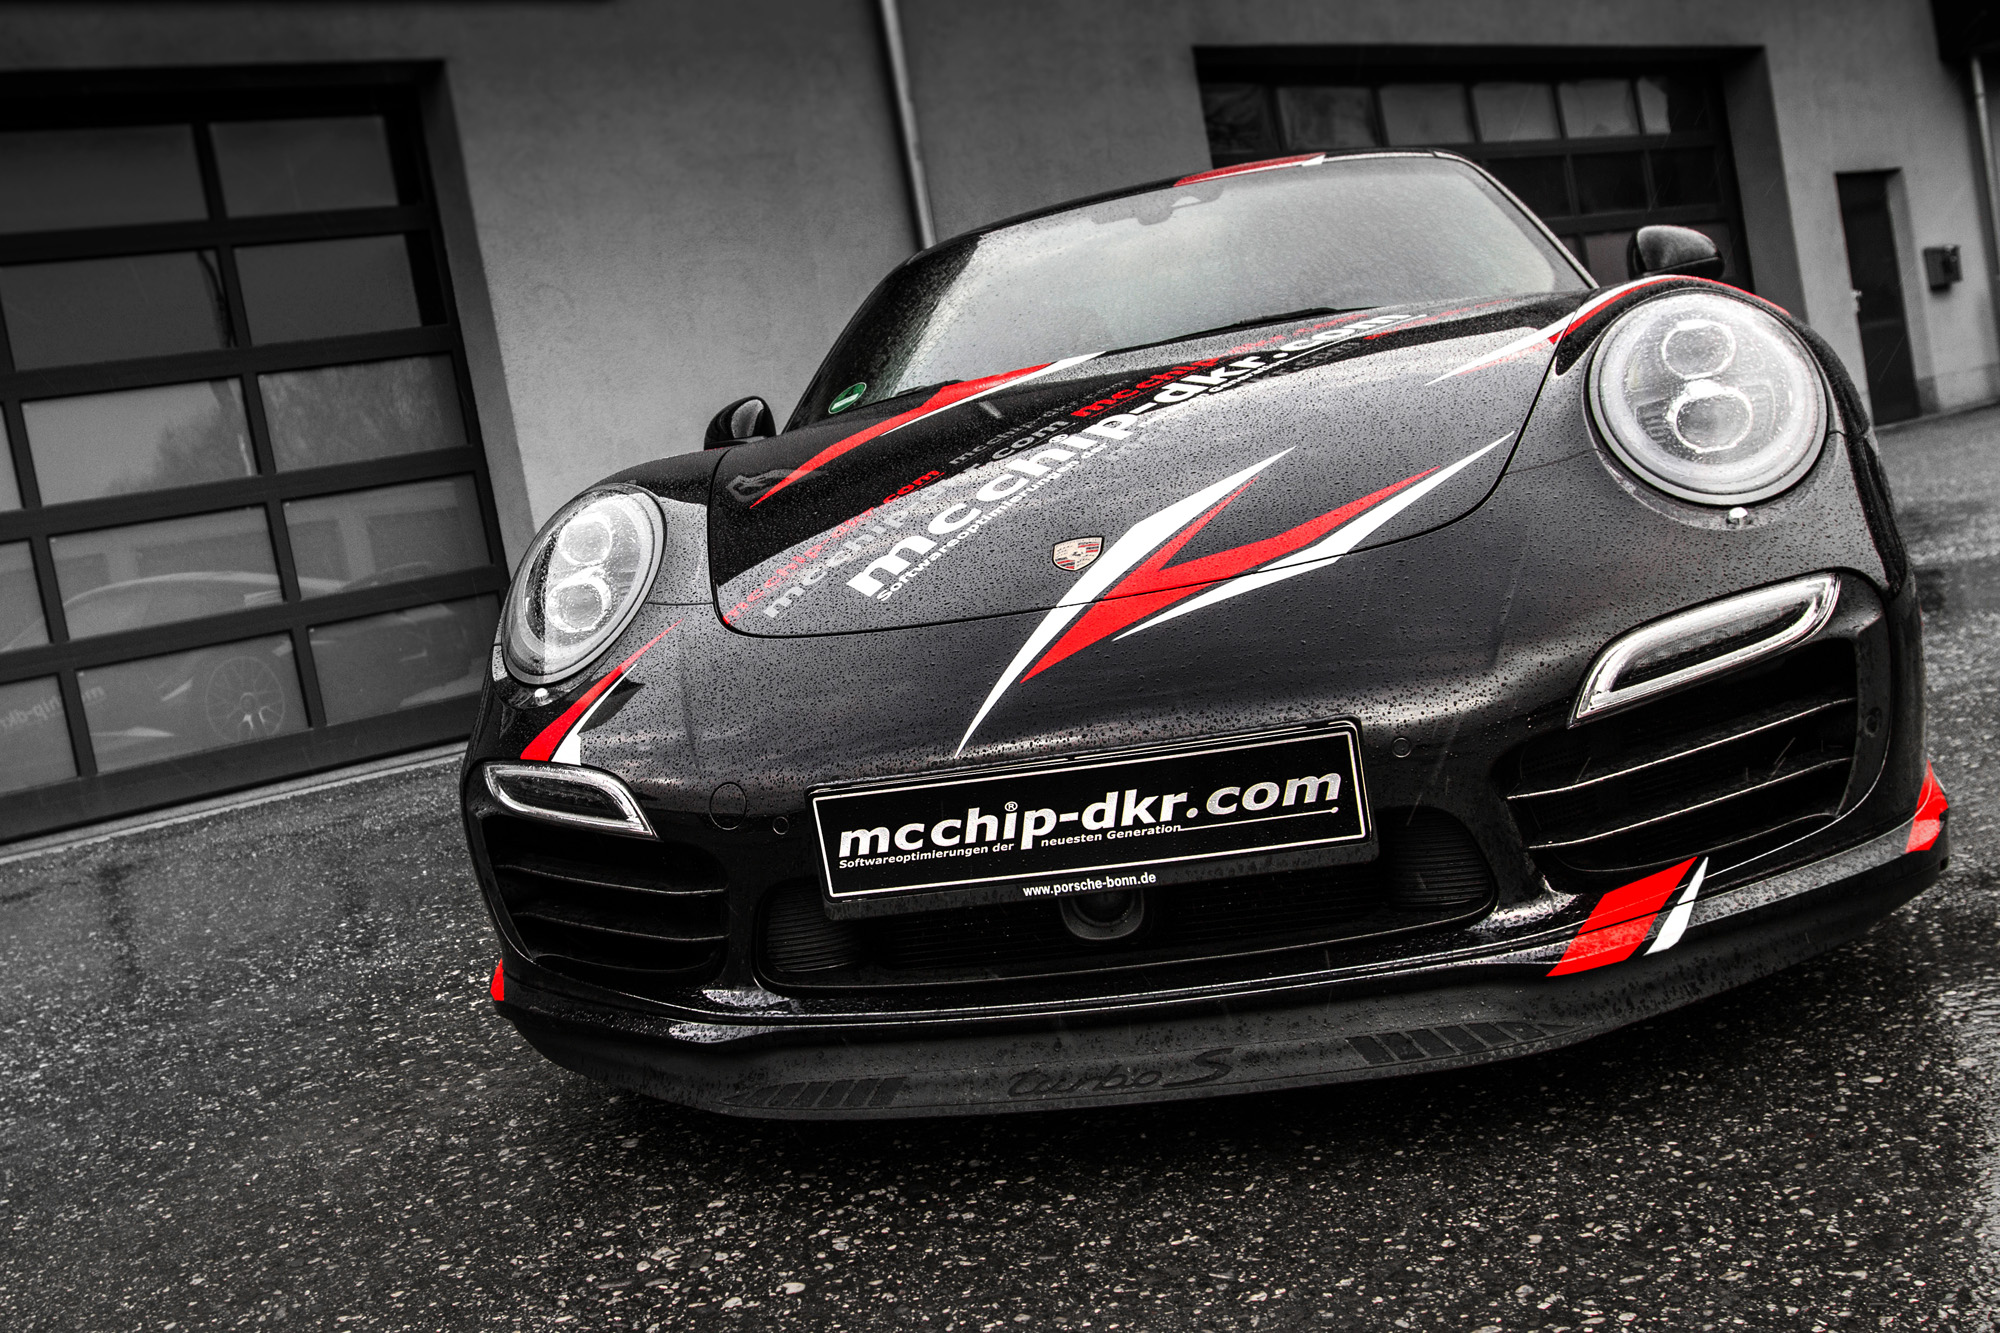 porsche-911-turbo-s-991-mcchip-dkr-06